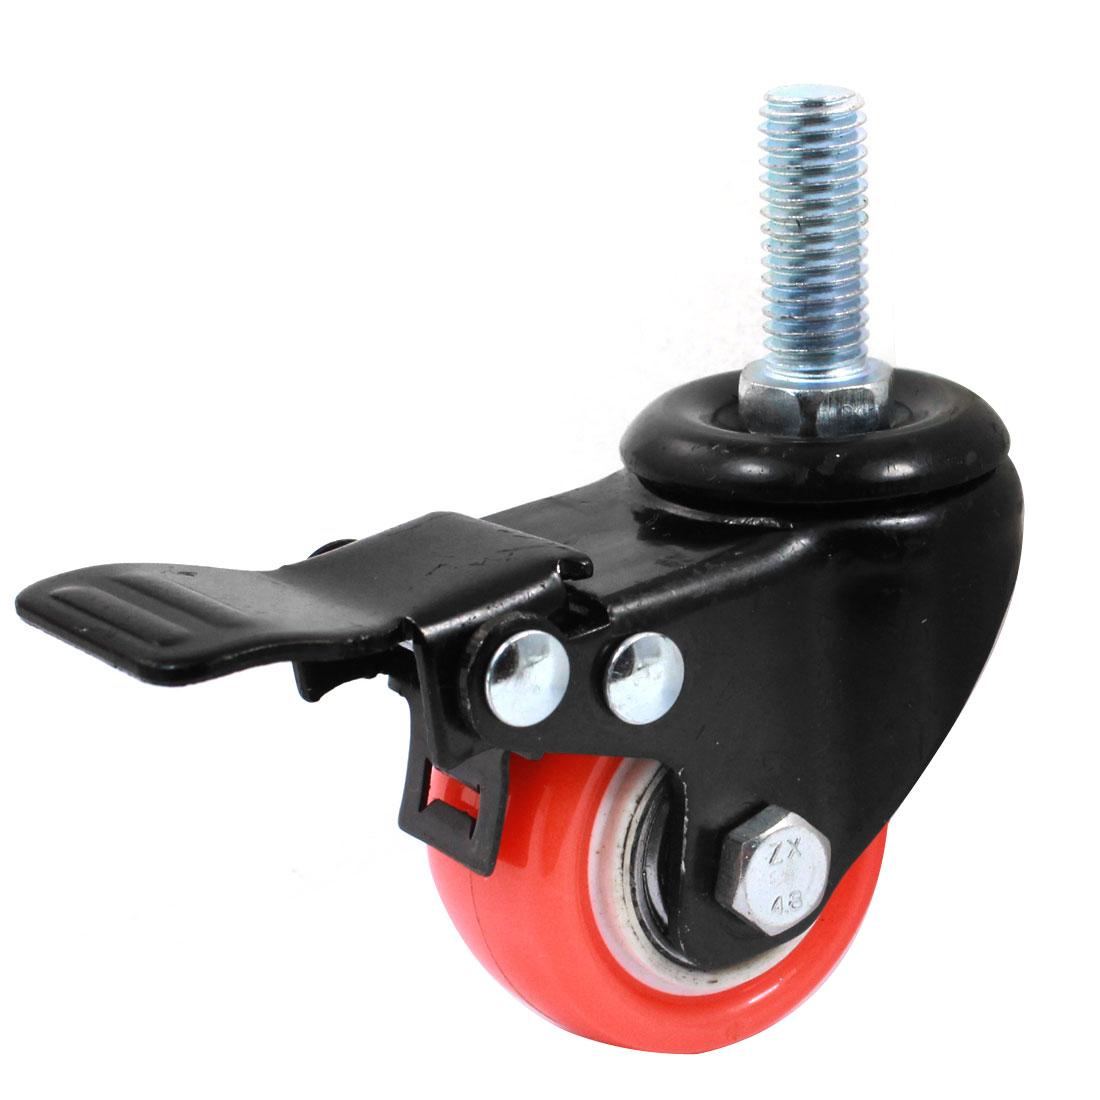 "Market Shopping Trolley Bakery Laundry Cart 10mm M10 Thread Dia 1.5"" Rotary Round Wheel Brake Caster Black Orange"